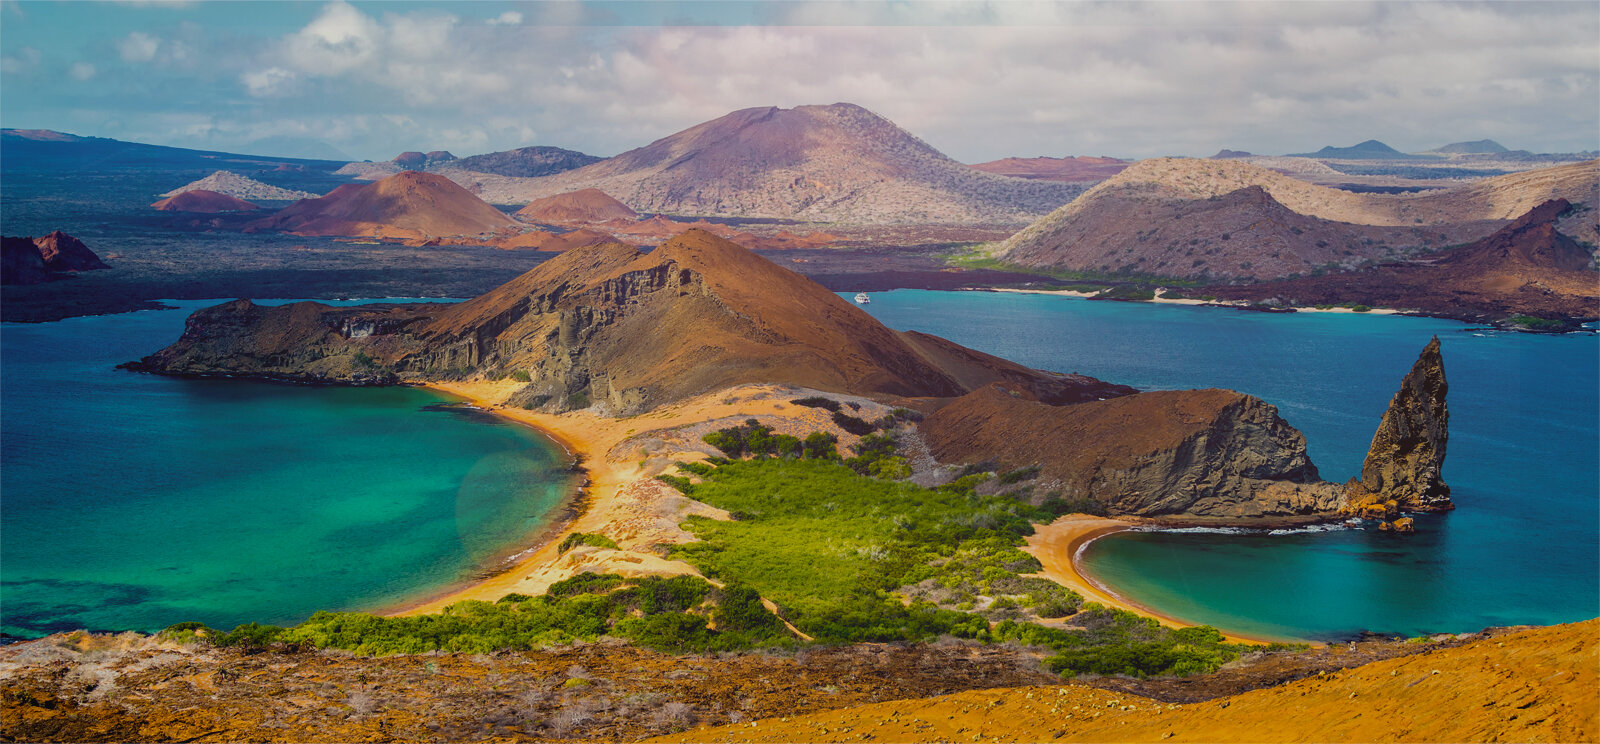 Destination_Headers_Galapagos7-1.jpg